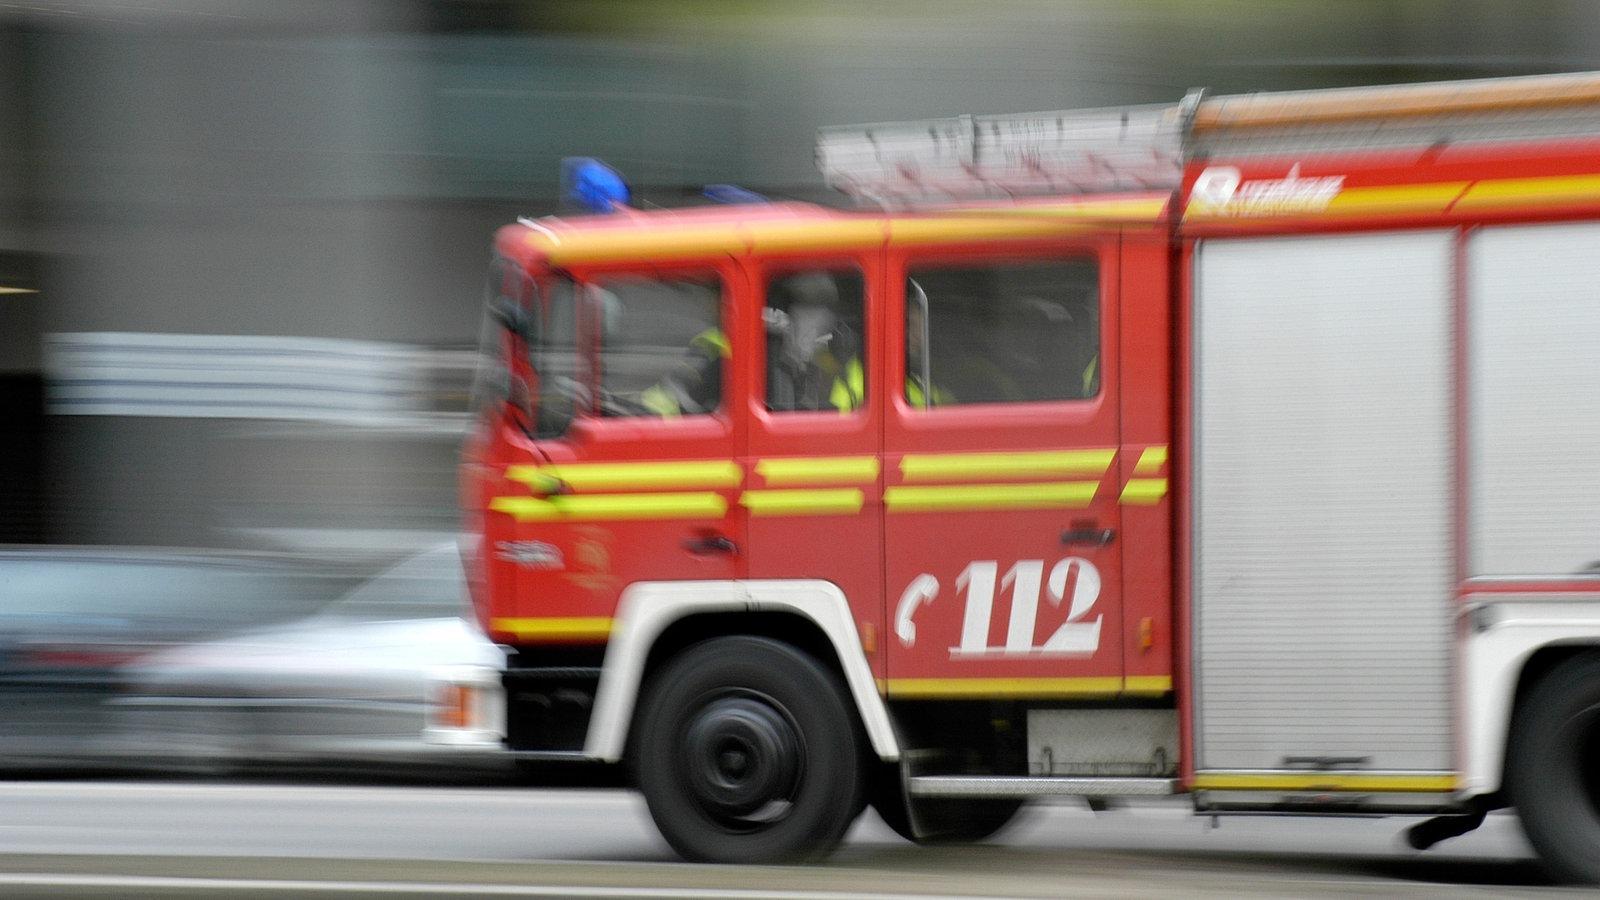 Freiwillige Feuerwehr Laage